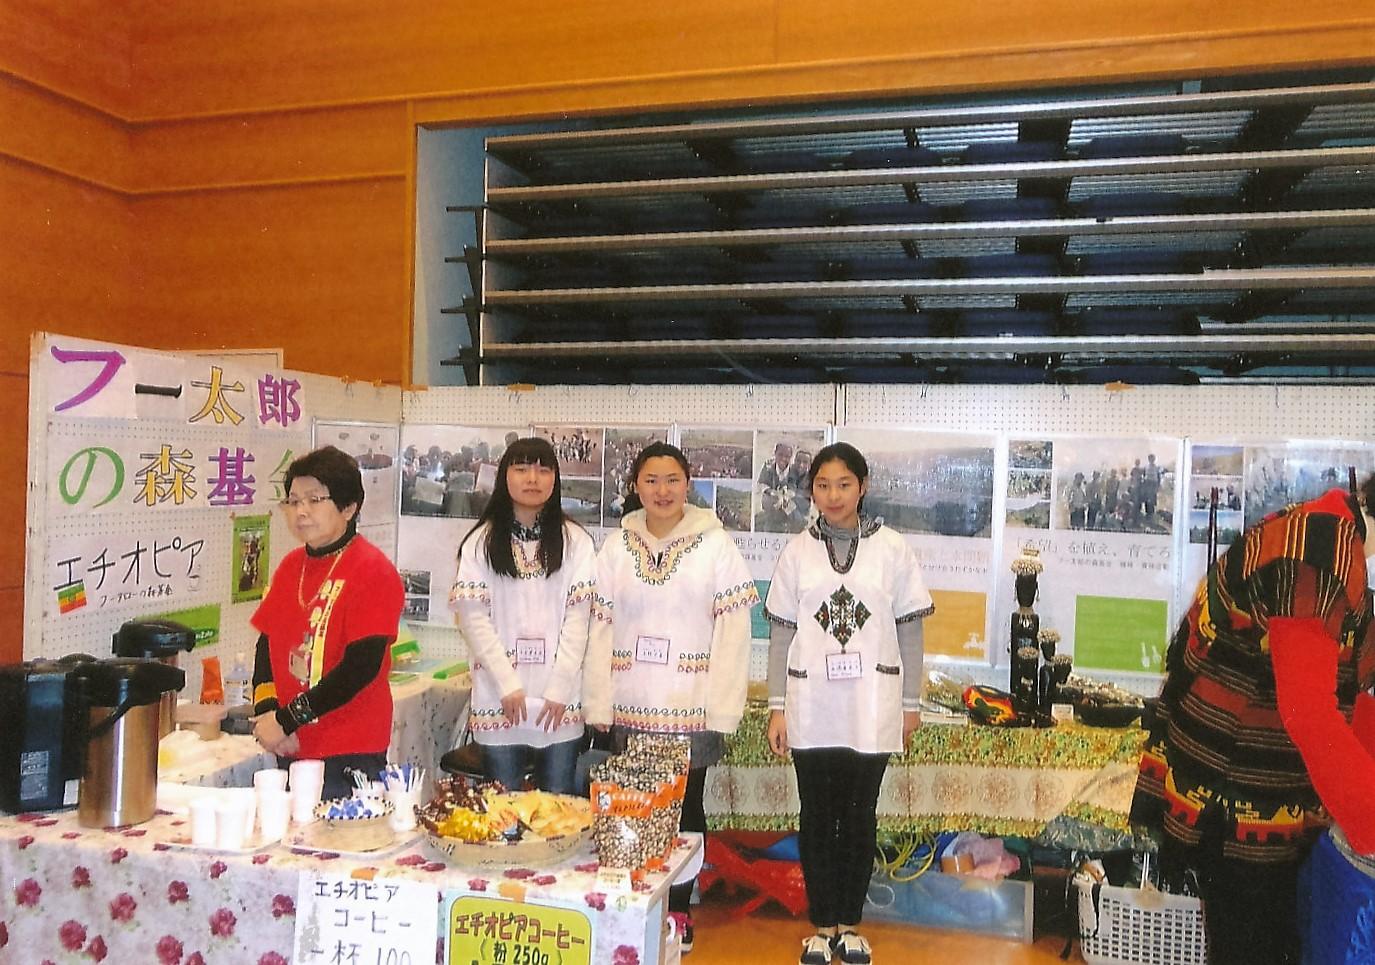 http://futaro.org/市民祭り/IMG_0001.jpg